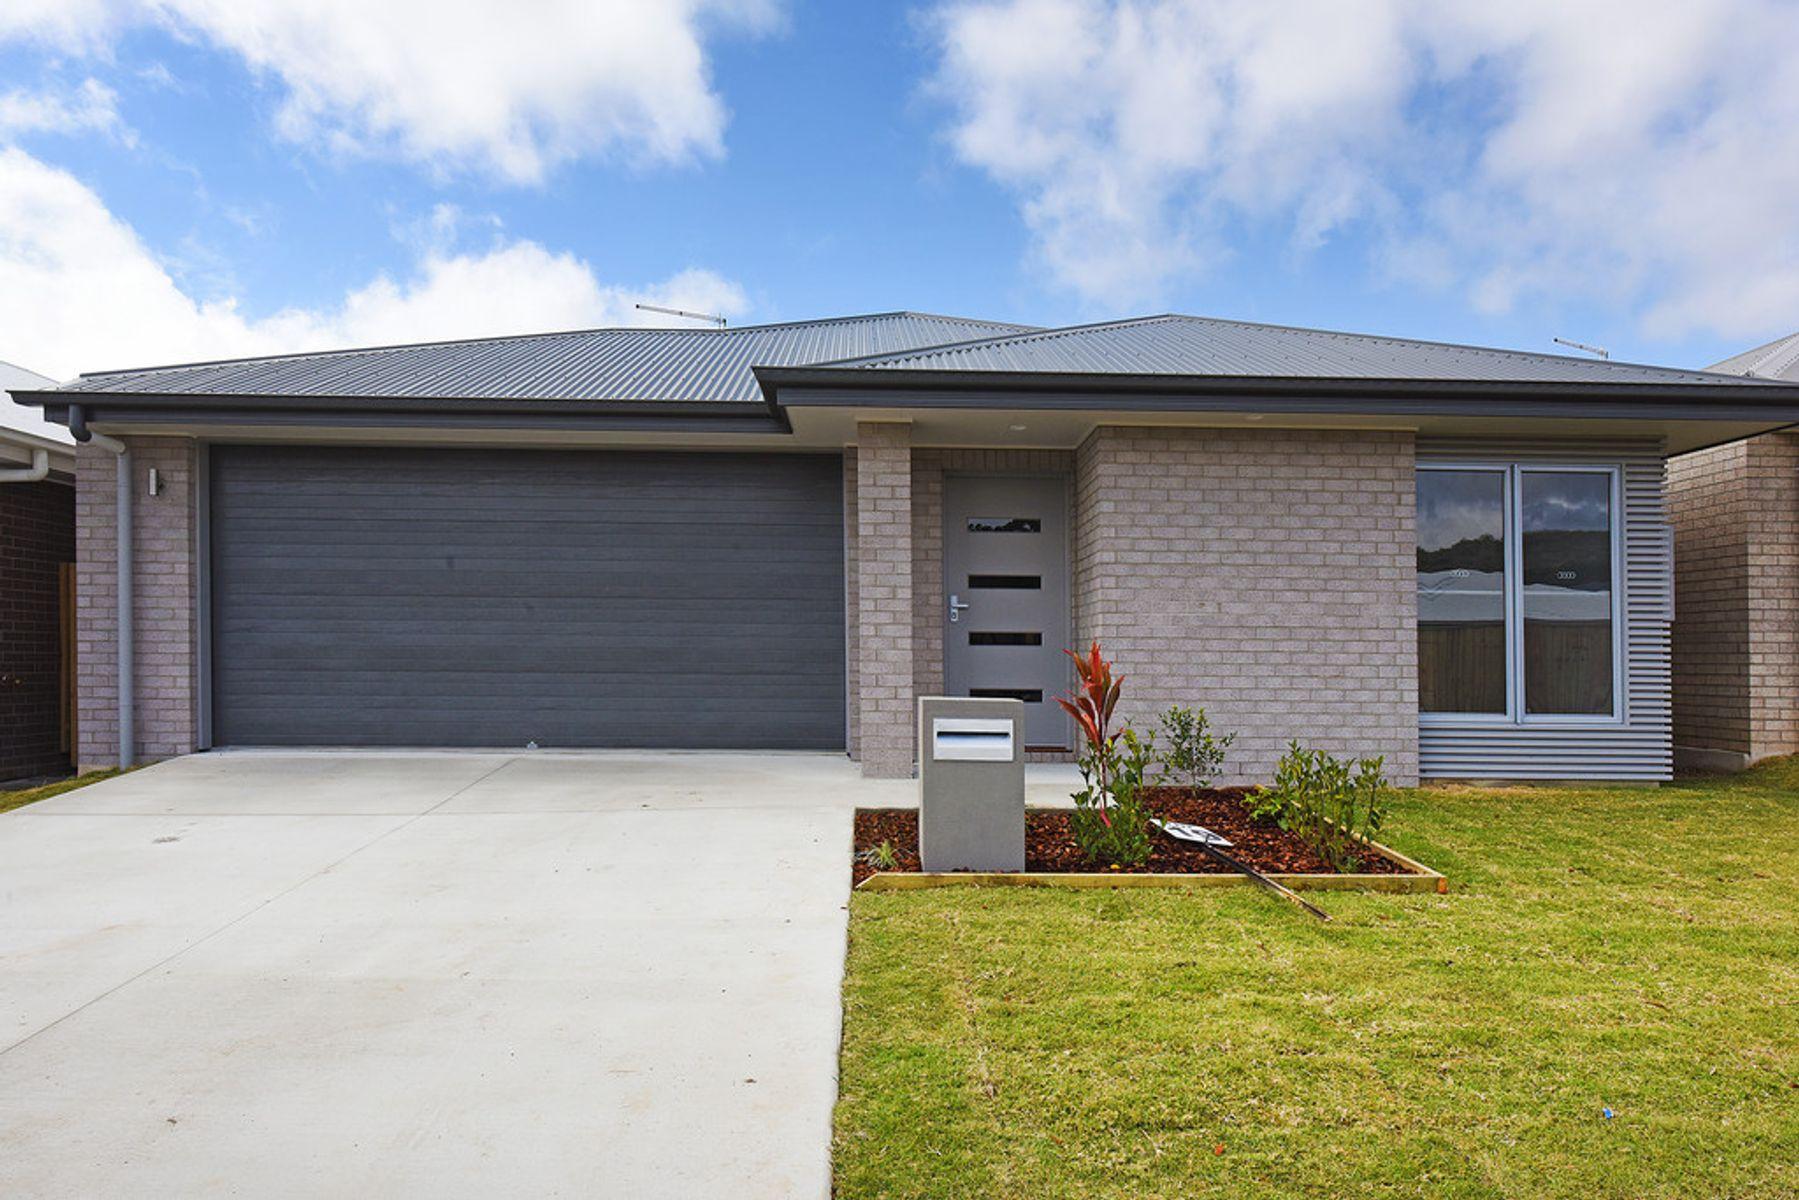 Lot 19/20 Crumpton Place, Beerwah, QLD 4519